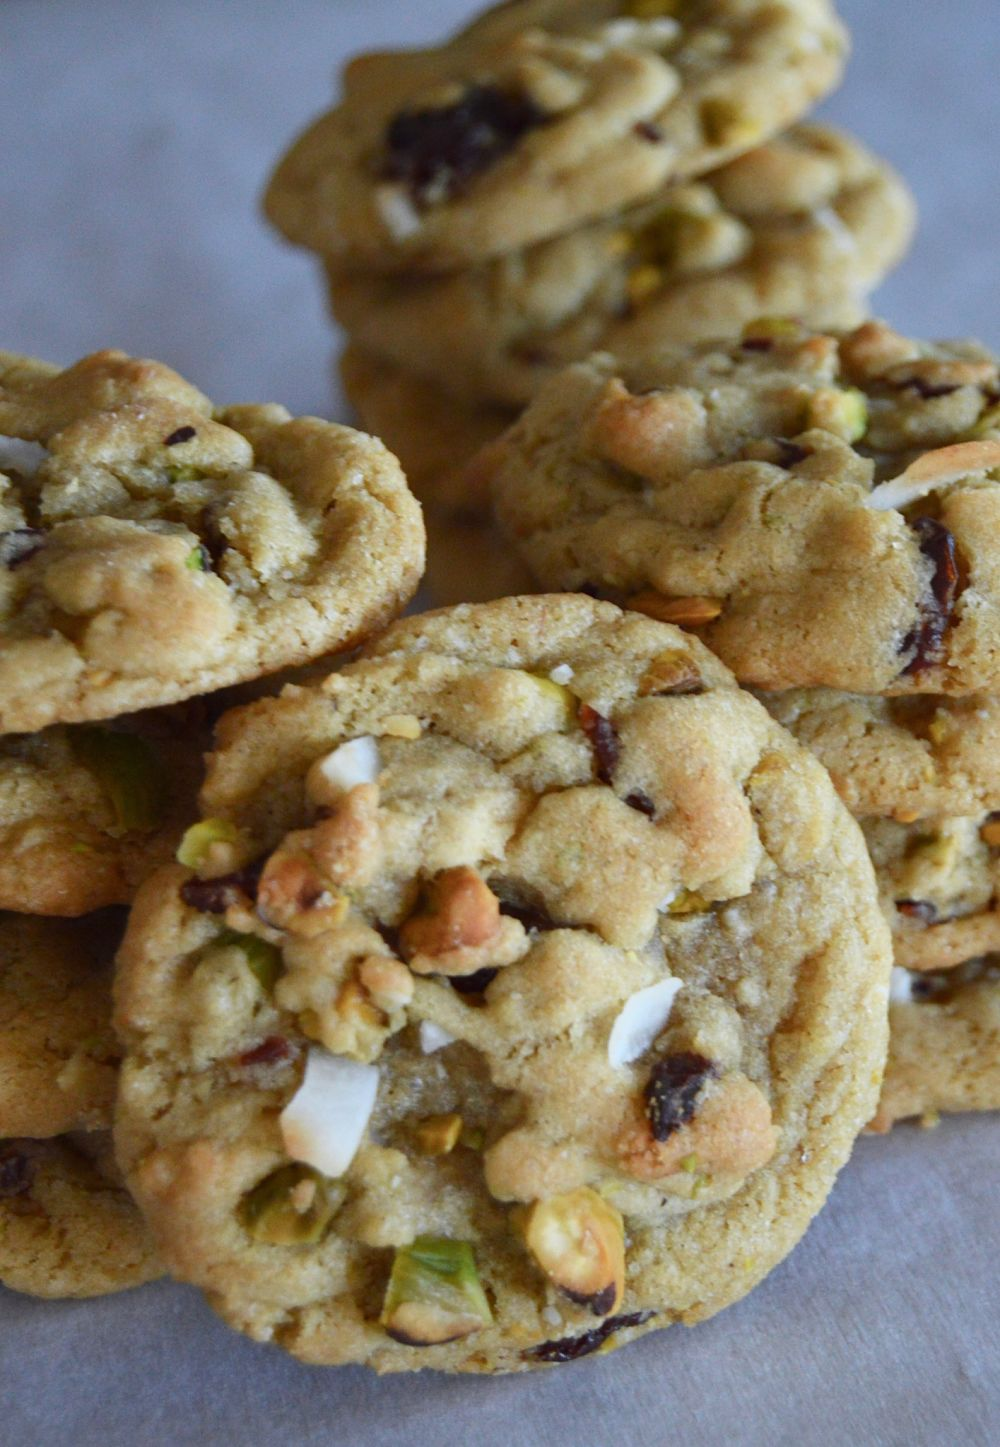 Tropical Christmas Cookies 3 1000_opt-2